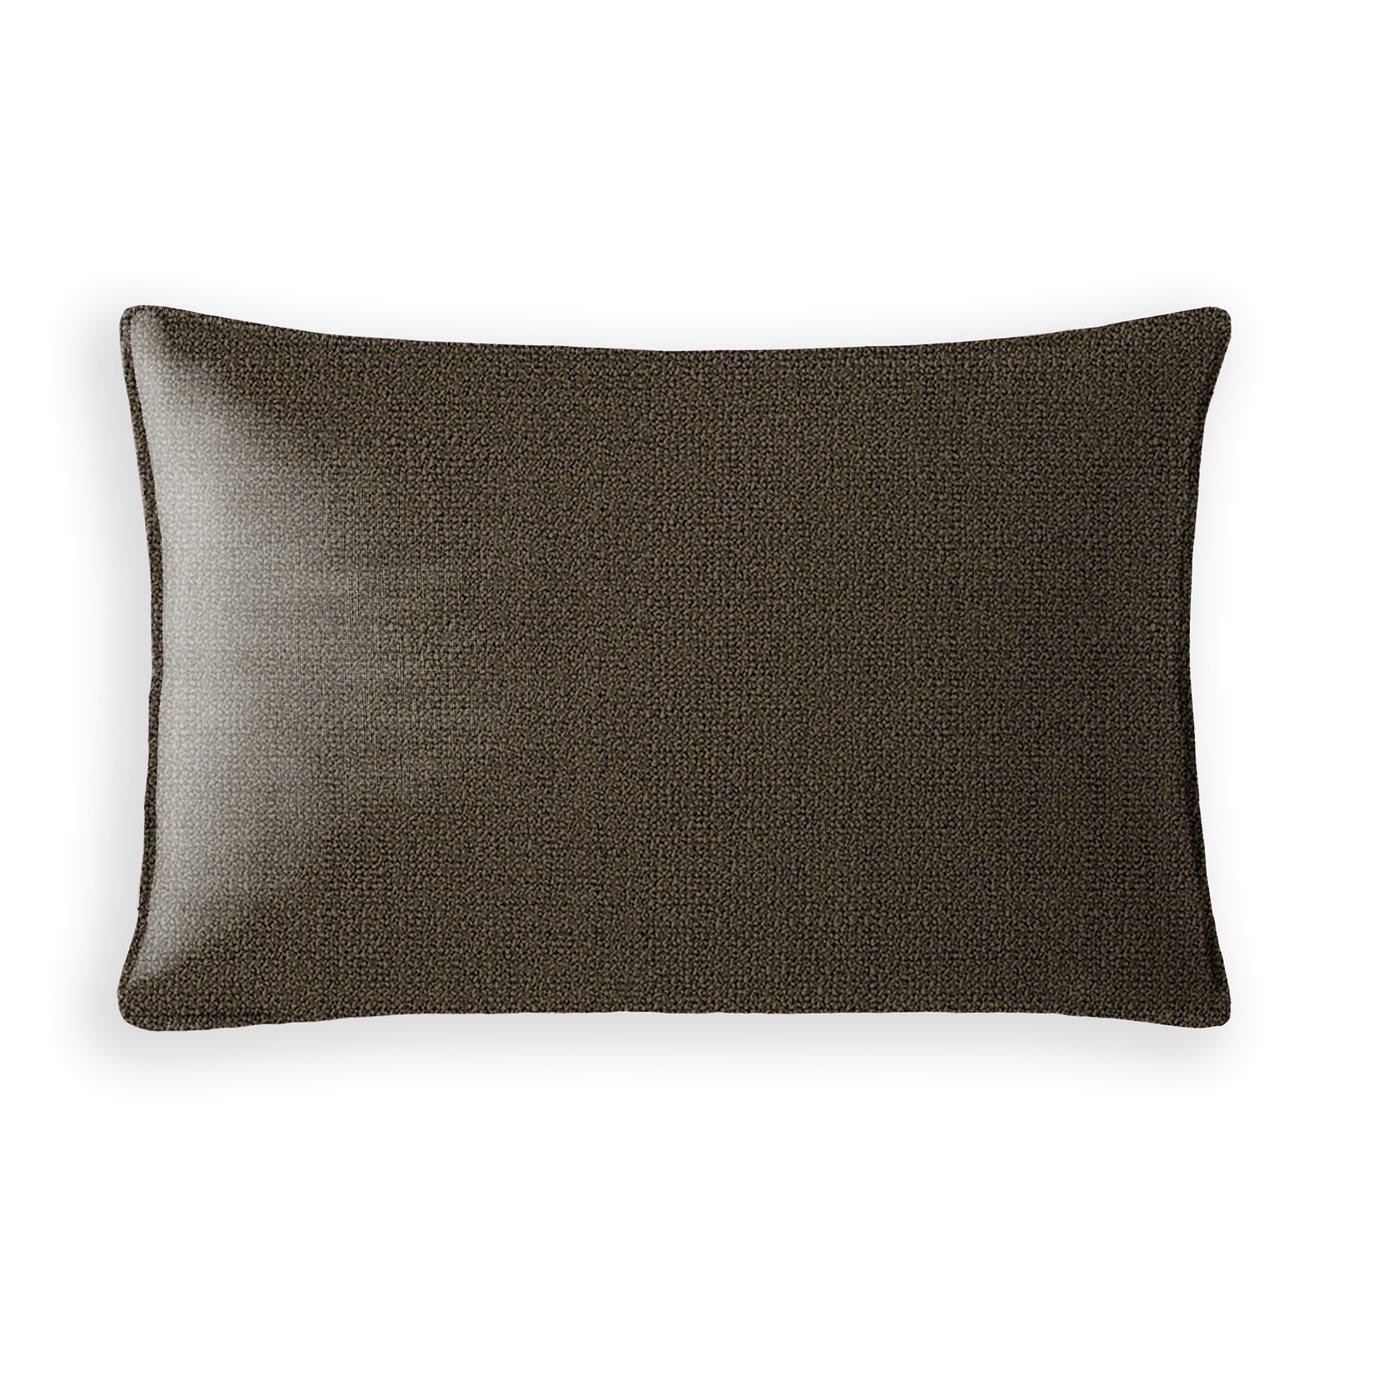 Nelson Decorative Cushion - Long Rectangle